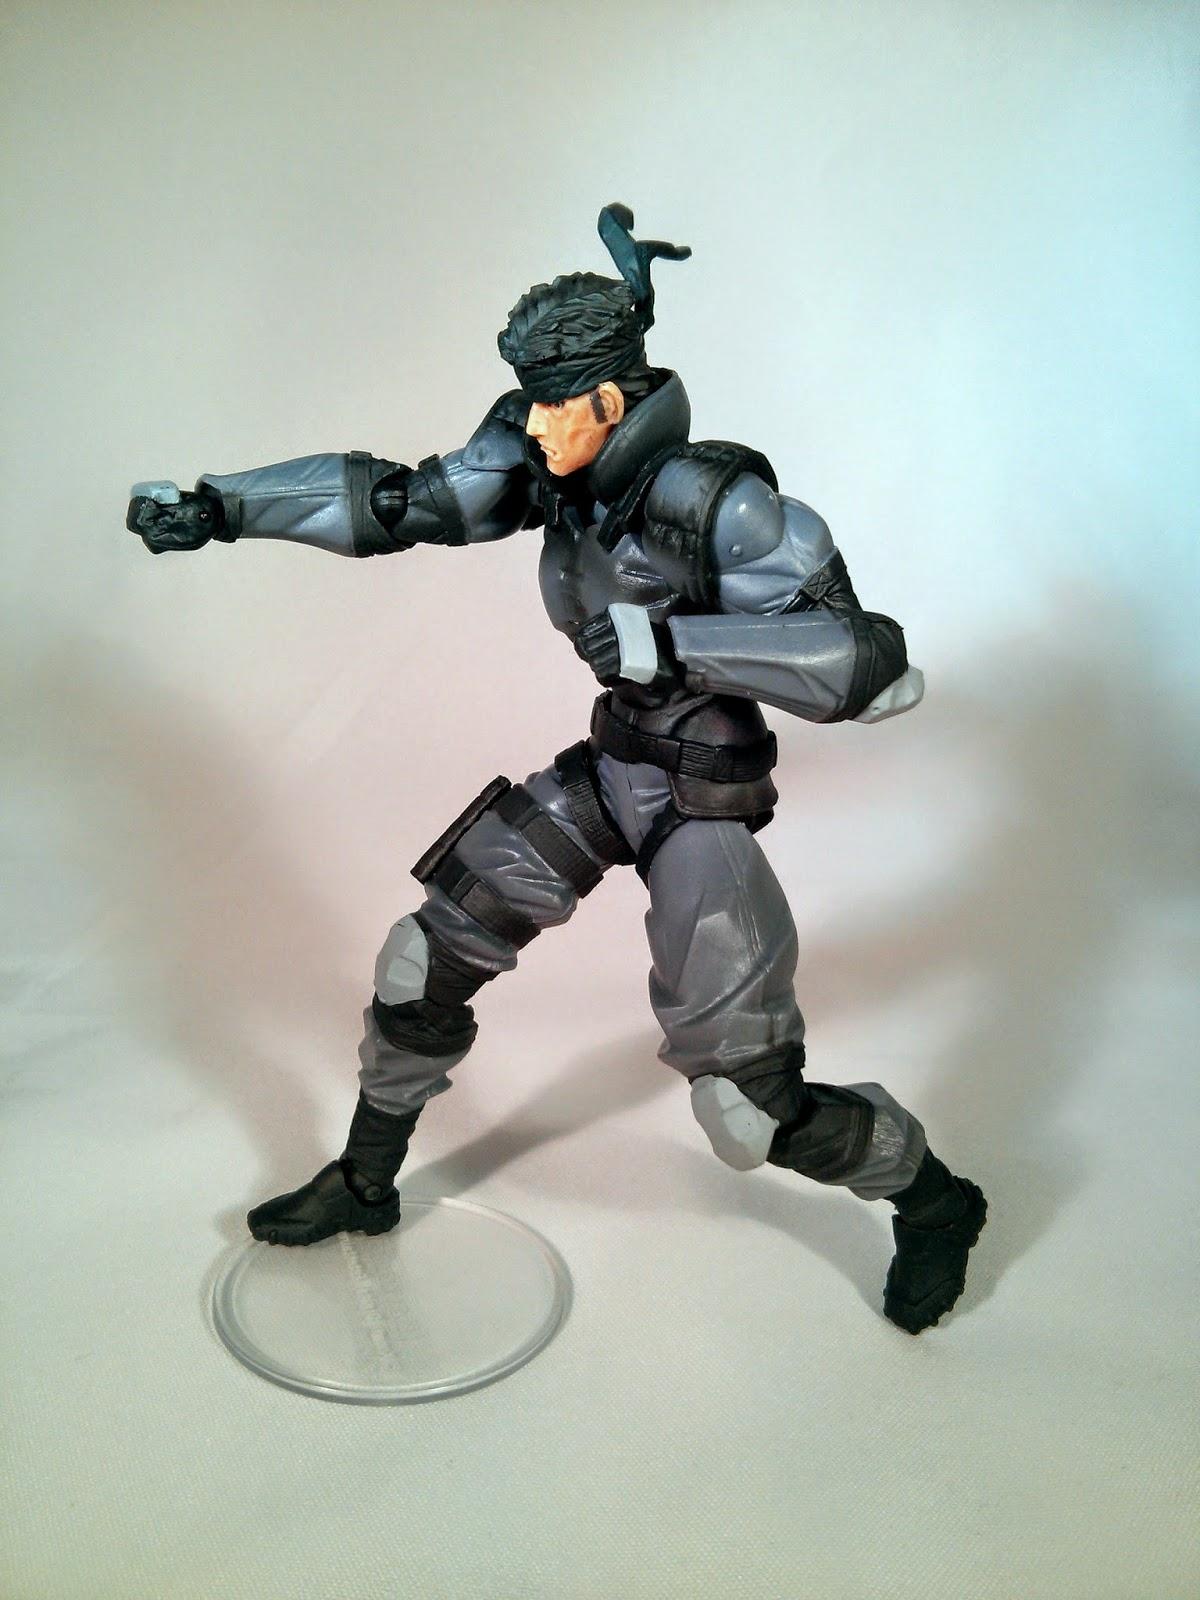 Revoltech Solid Snake articulation